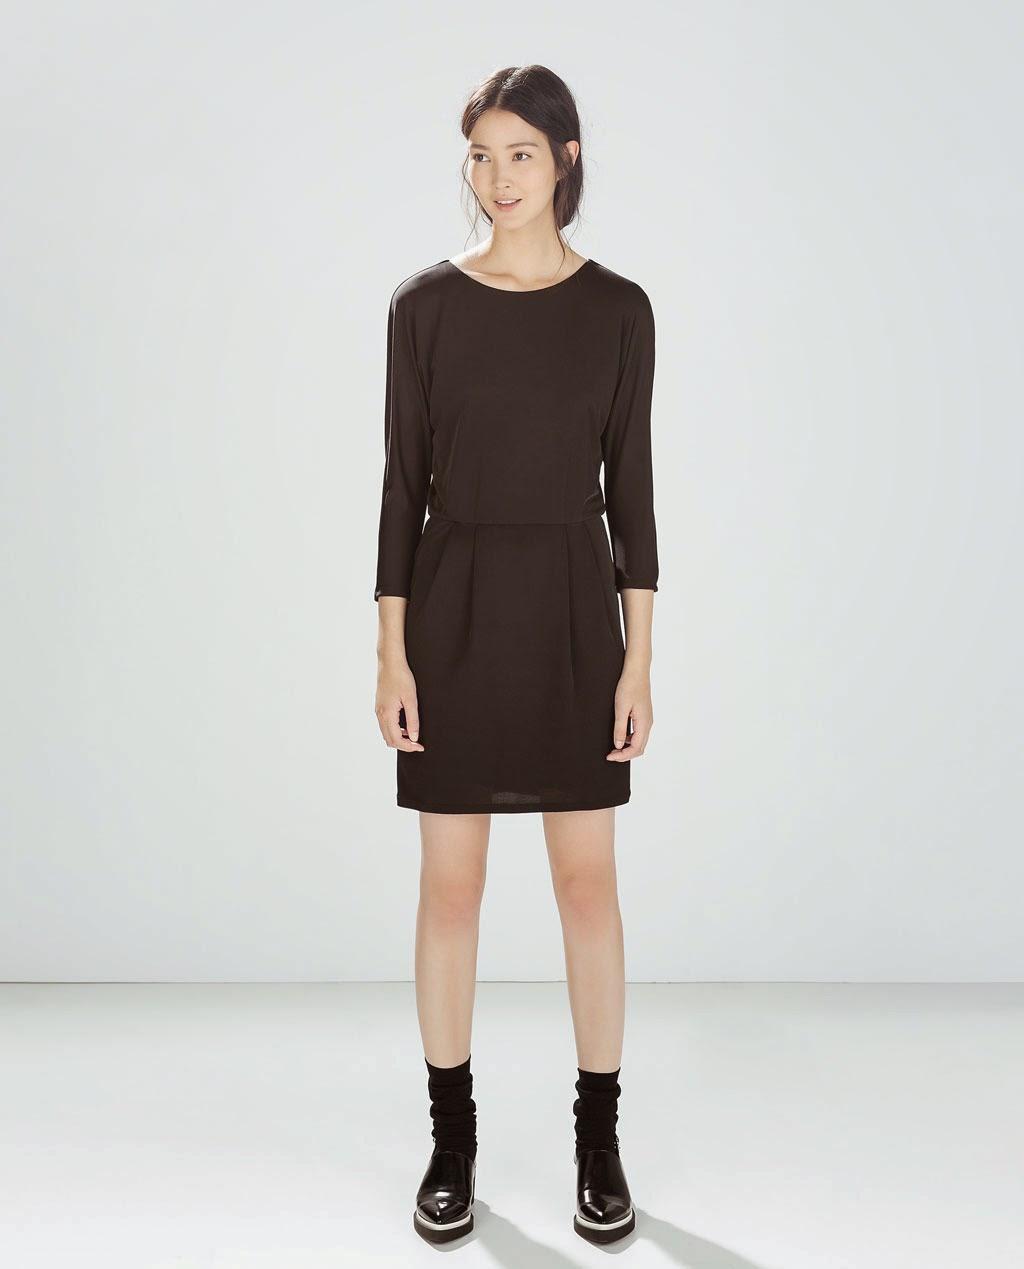 http://www.zara.com/es/es/mujer/vestidos/vestido-abertura-espalda-c269185p2178502.html?sharedProduct=true